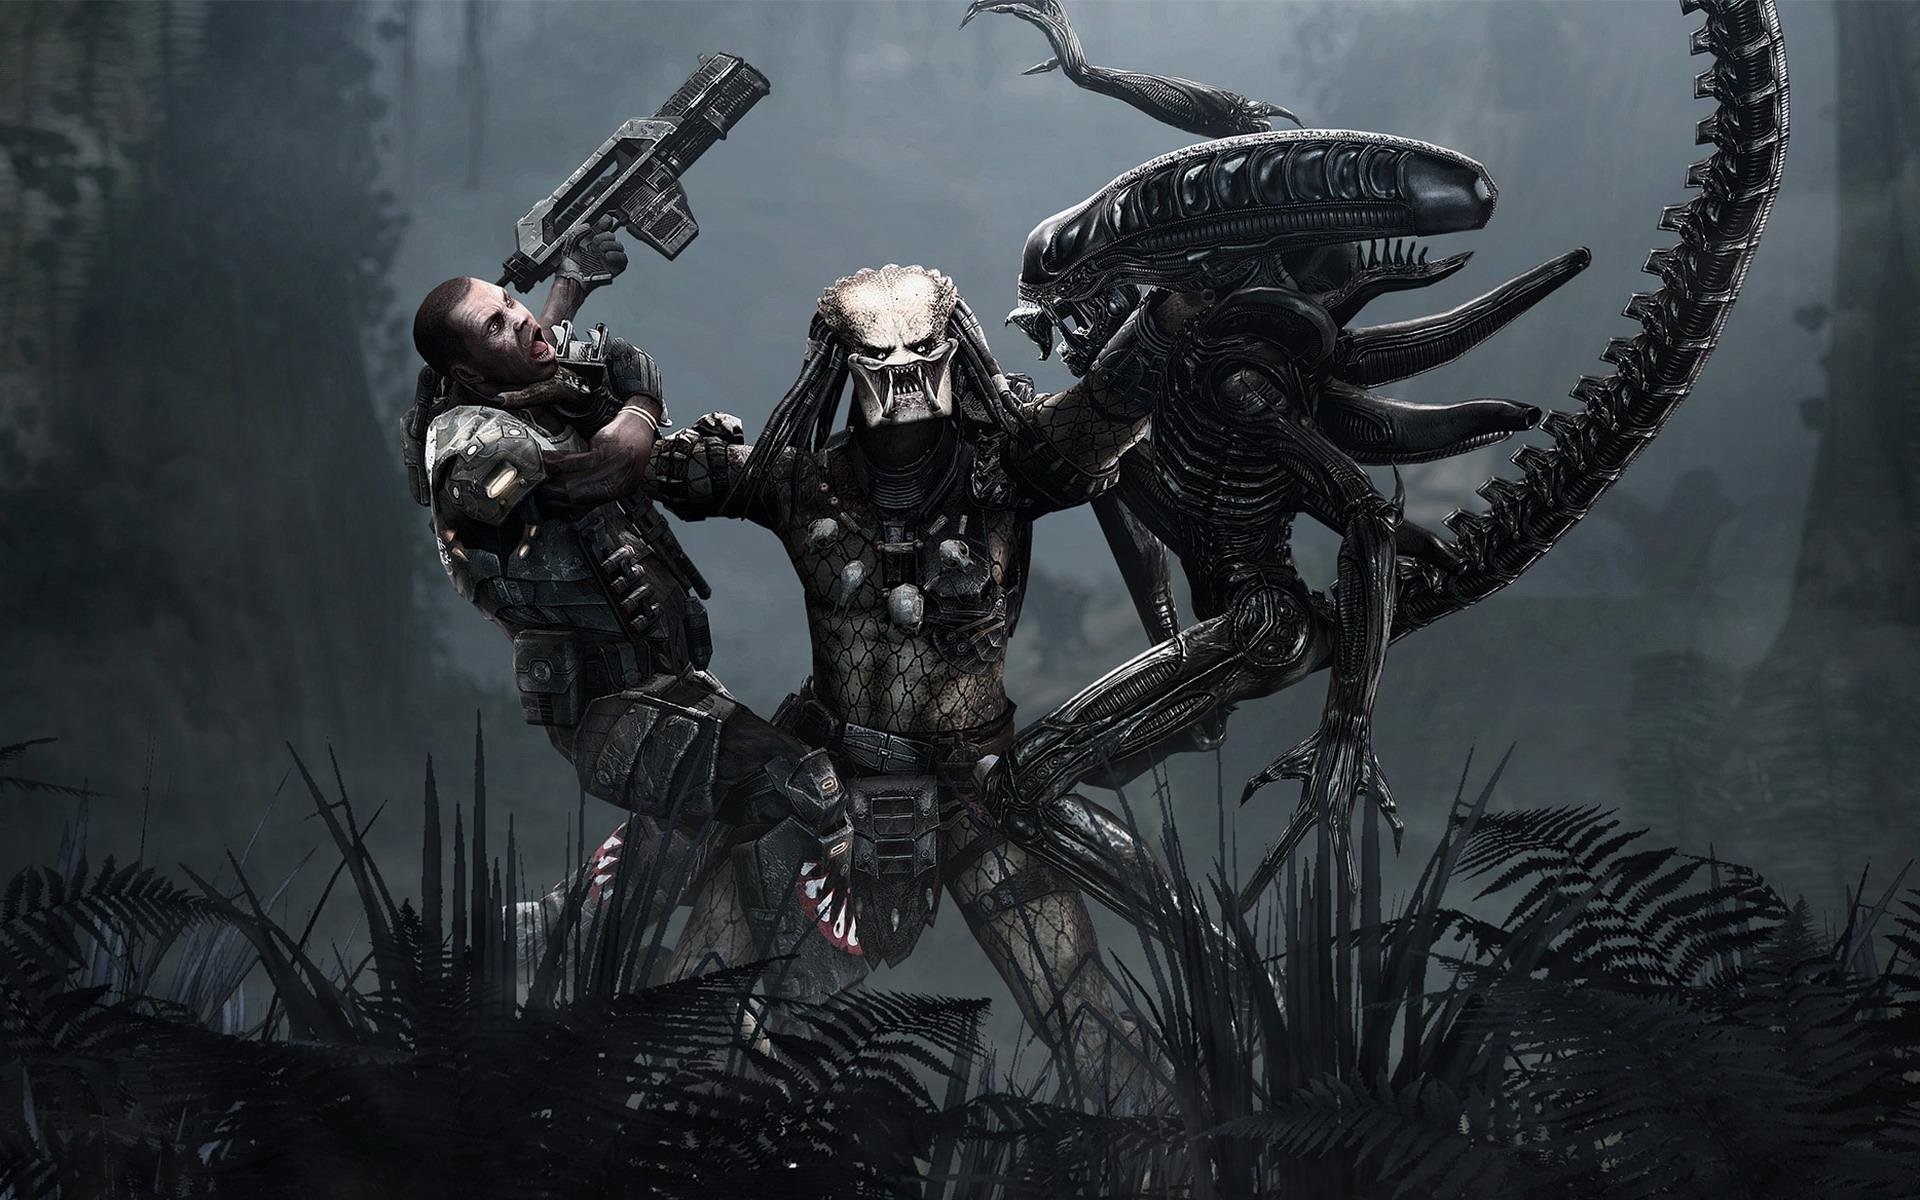 Aliens Vs Predator Game Wallpapers HD Wallpapers 1920x1200